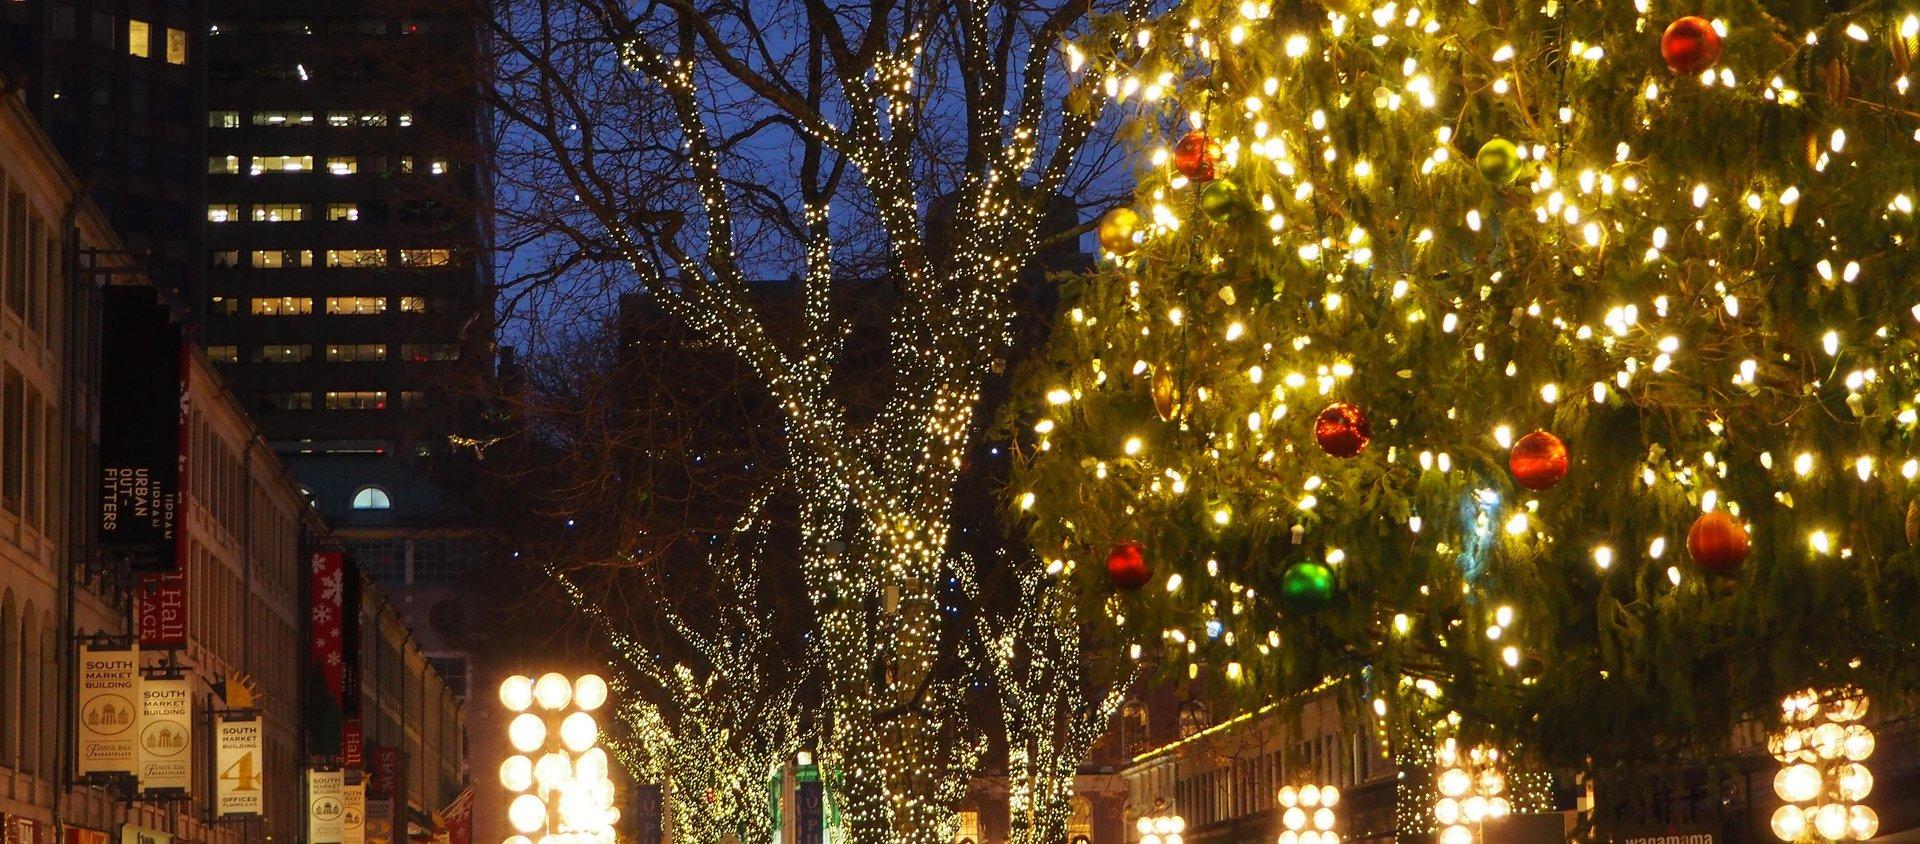 Christmas Lights in Boston - Best Season 2020